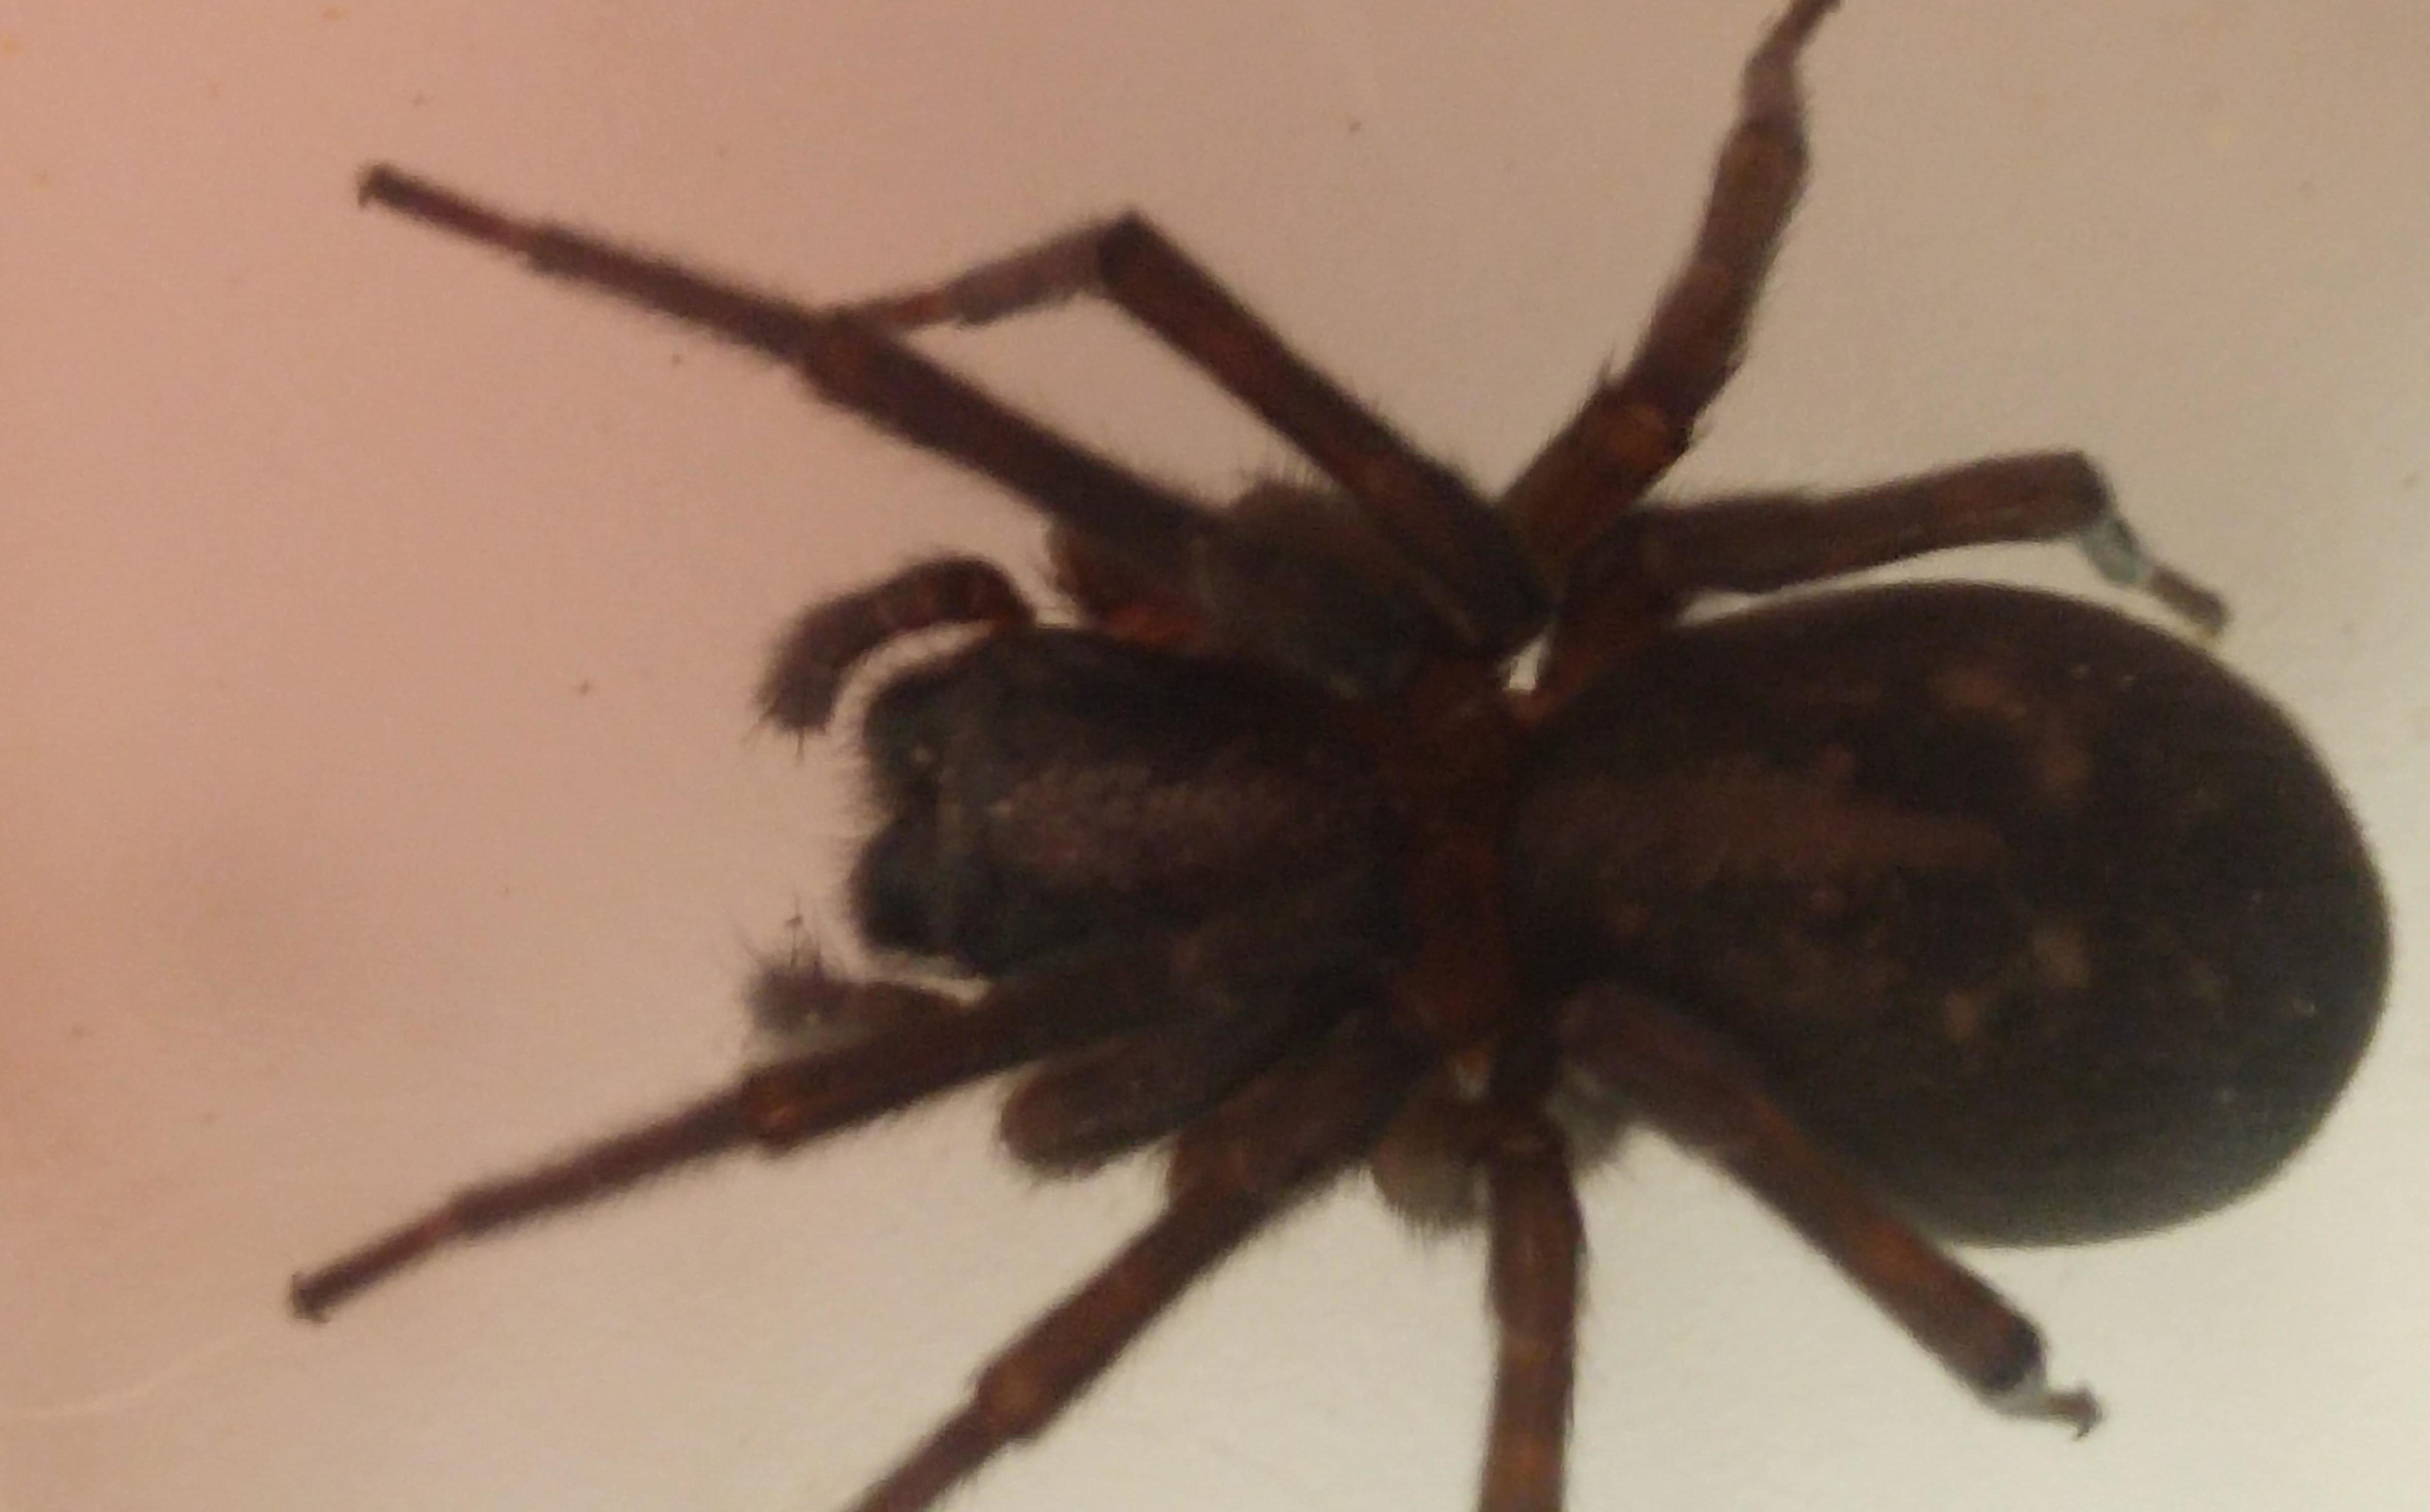 Picture of Amaurobius ferox (Black Lace-Weaver) - Dorsal